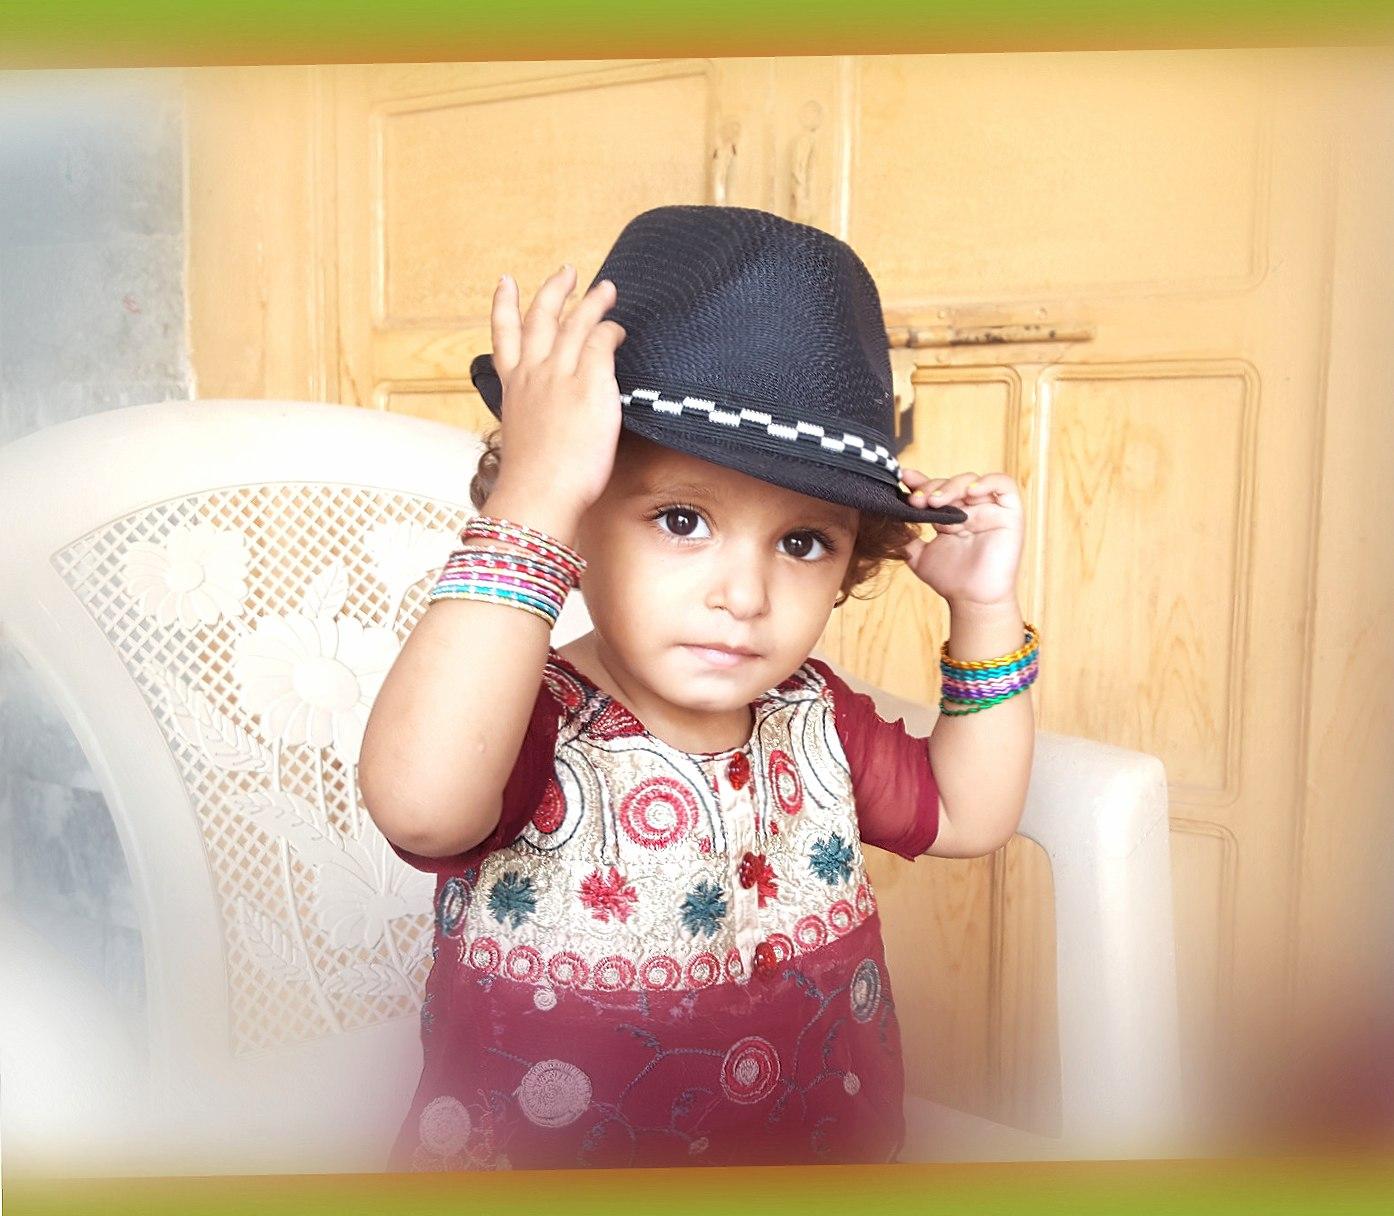 Fatima Dear wallpapers HD quality